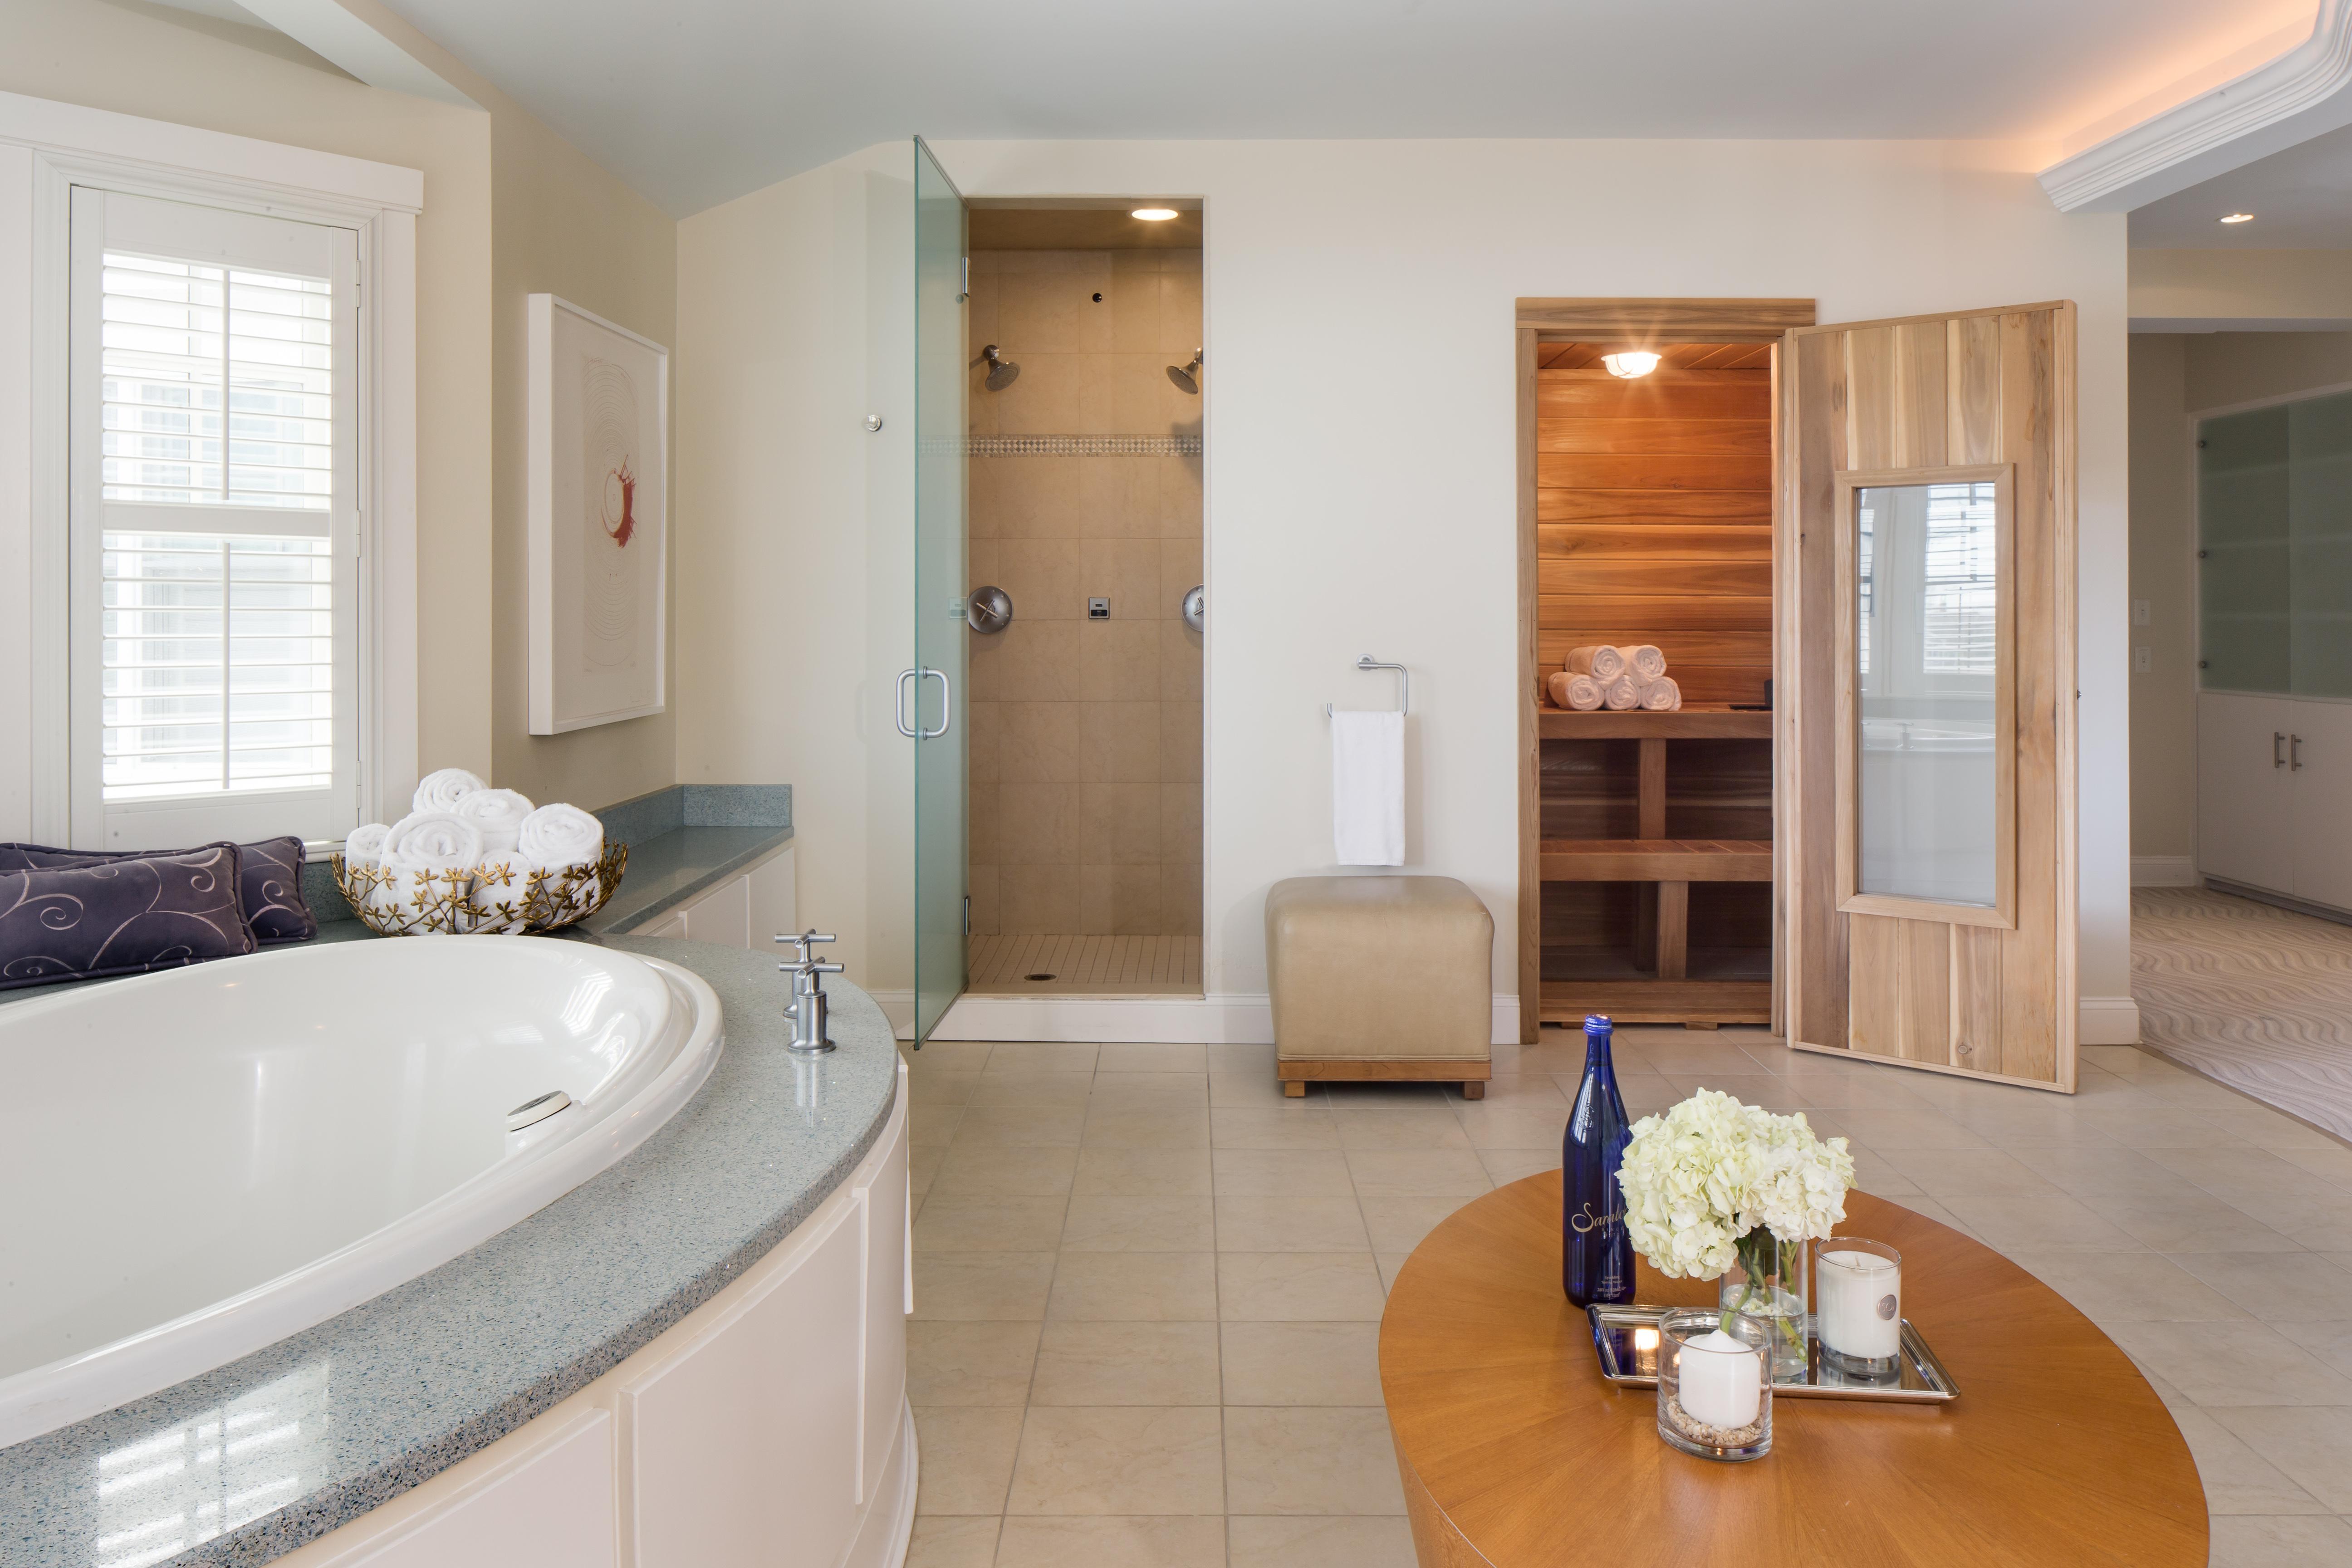 Chatham Bars Inn spa suite.